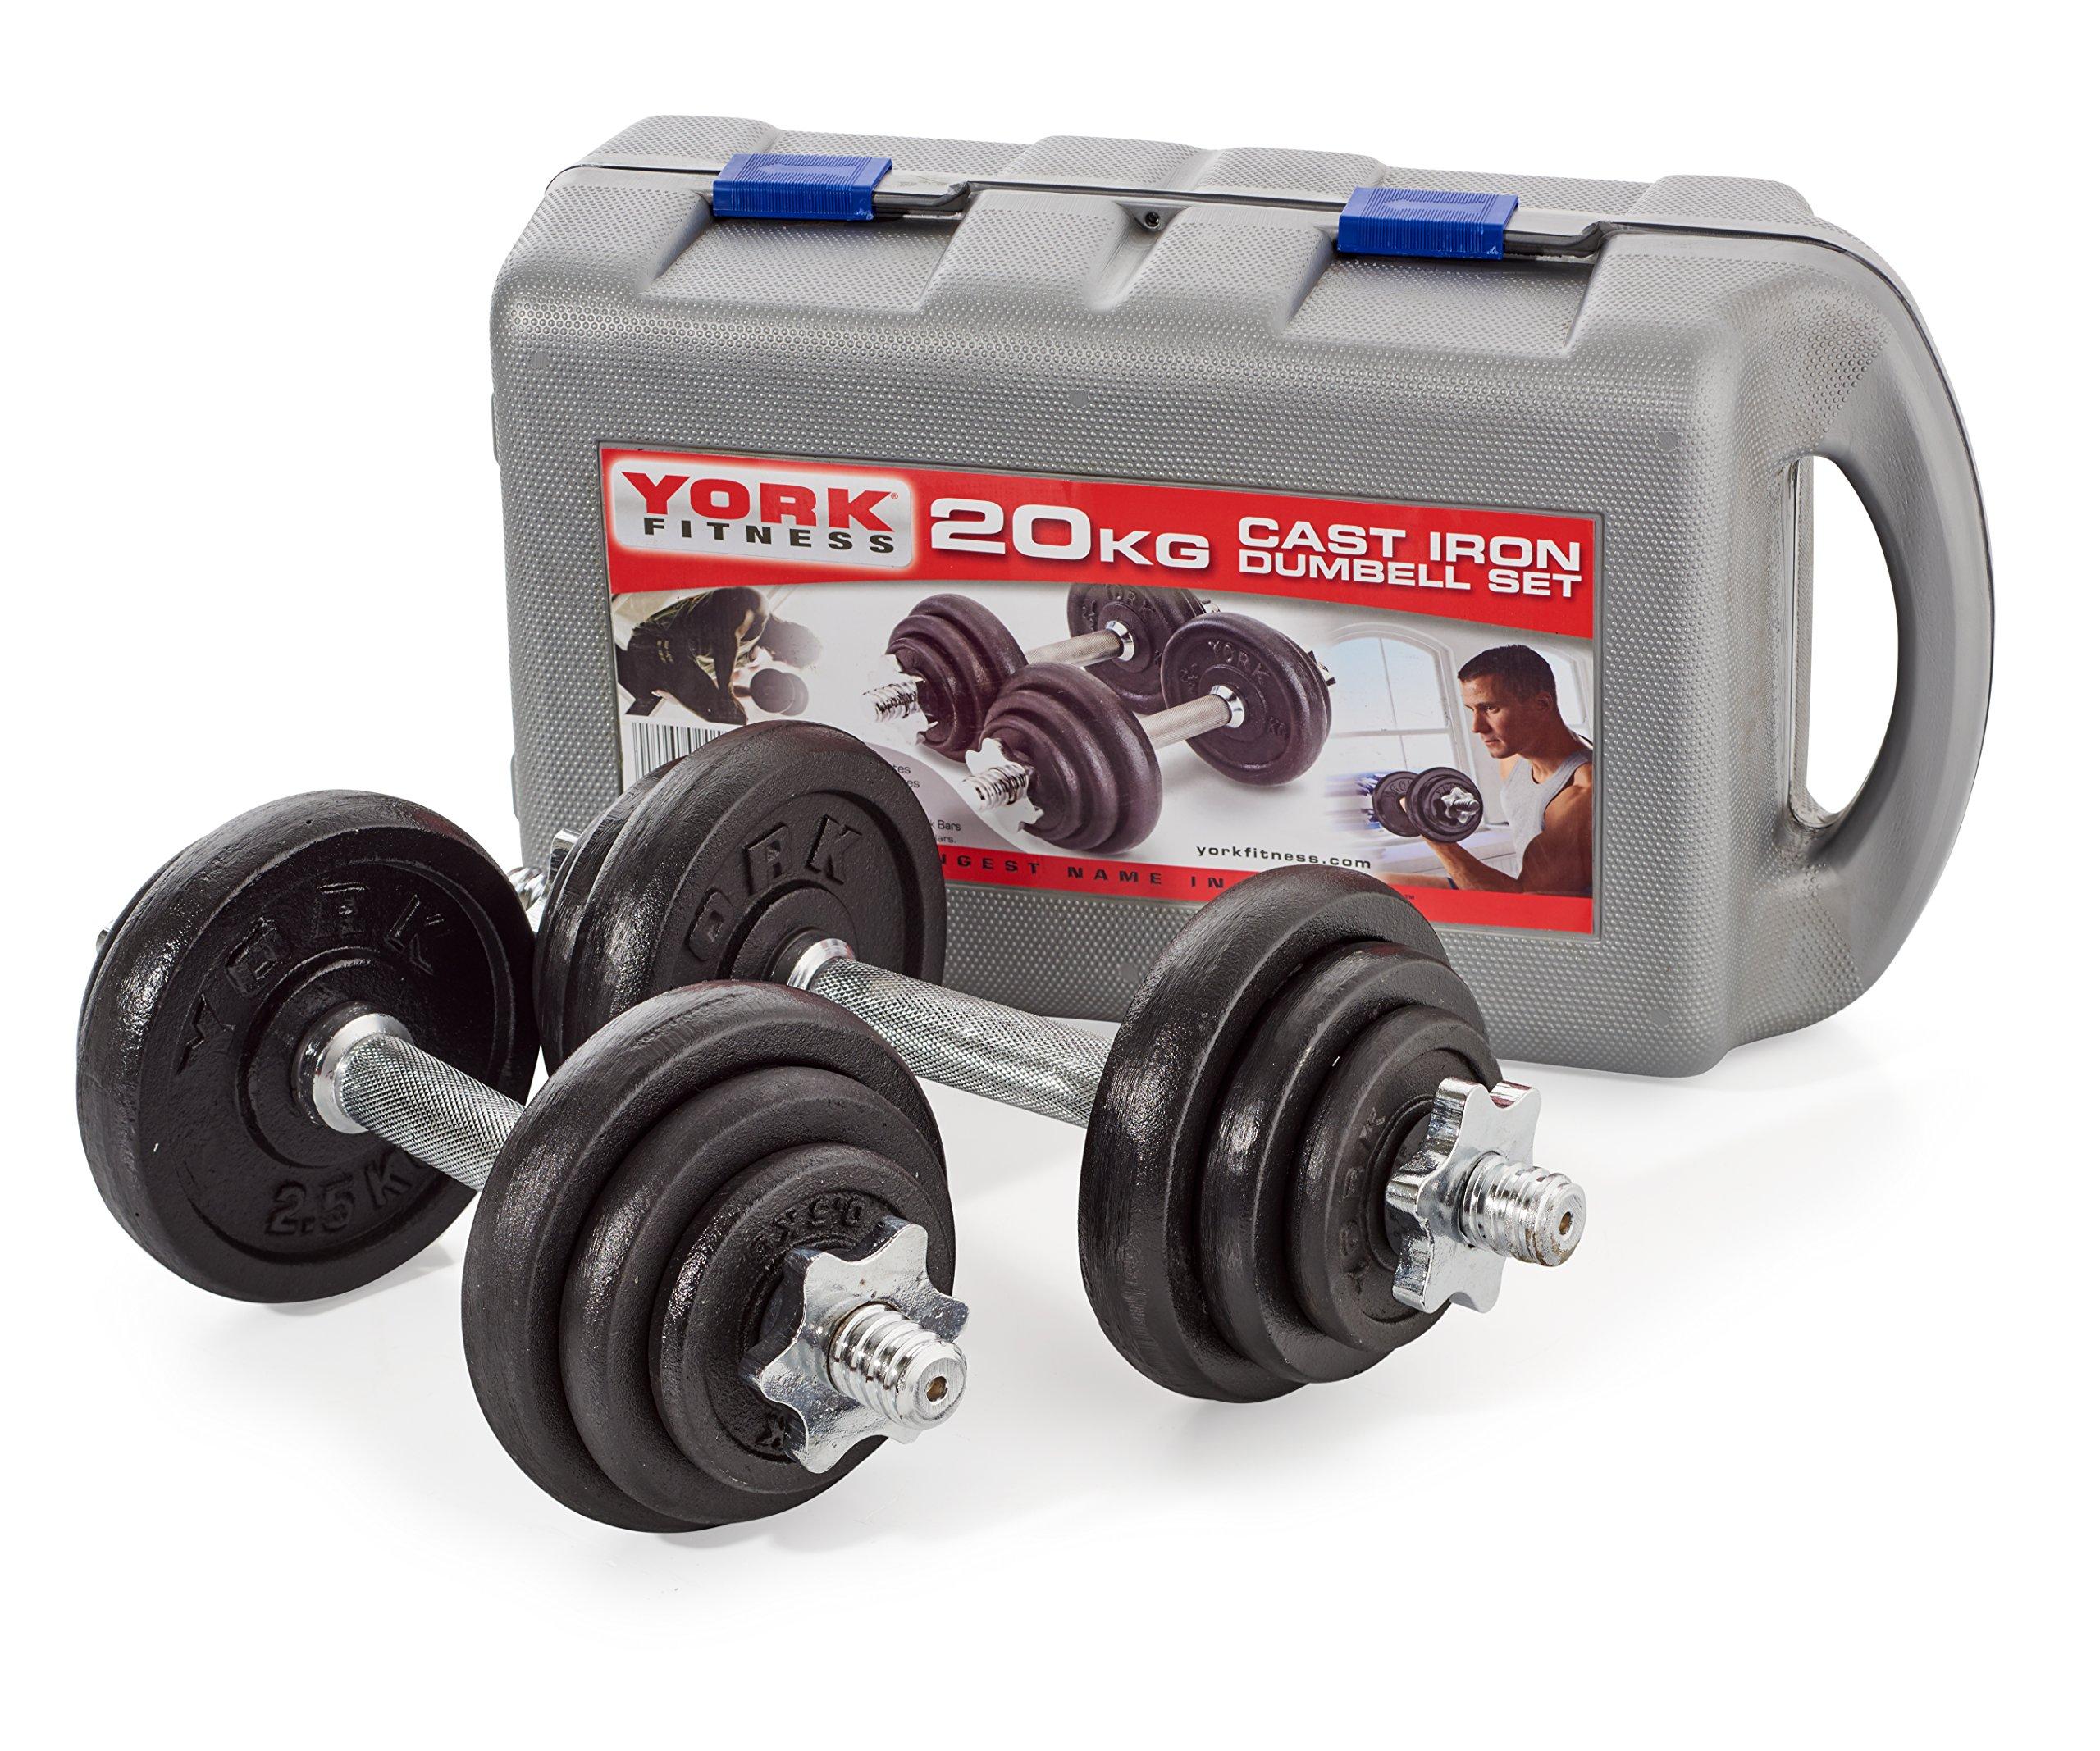 York Fitness - Set de 2 mancuernas 10kg/u product image